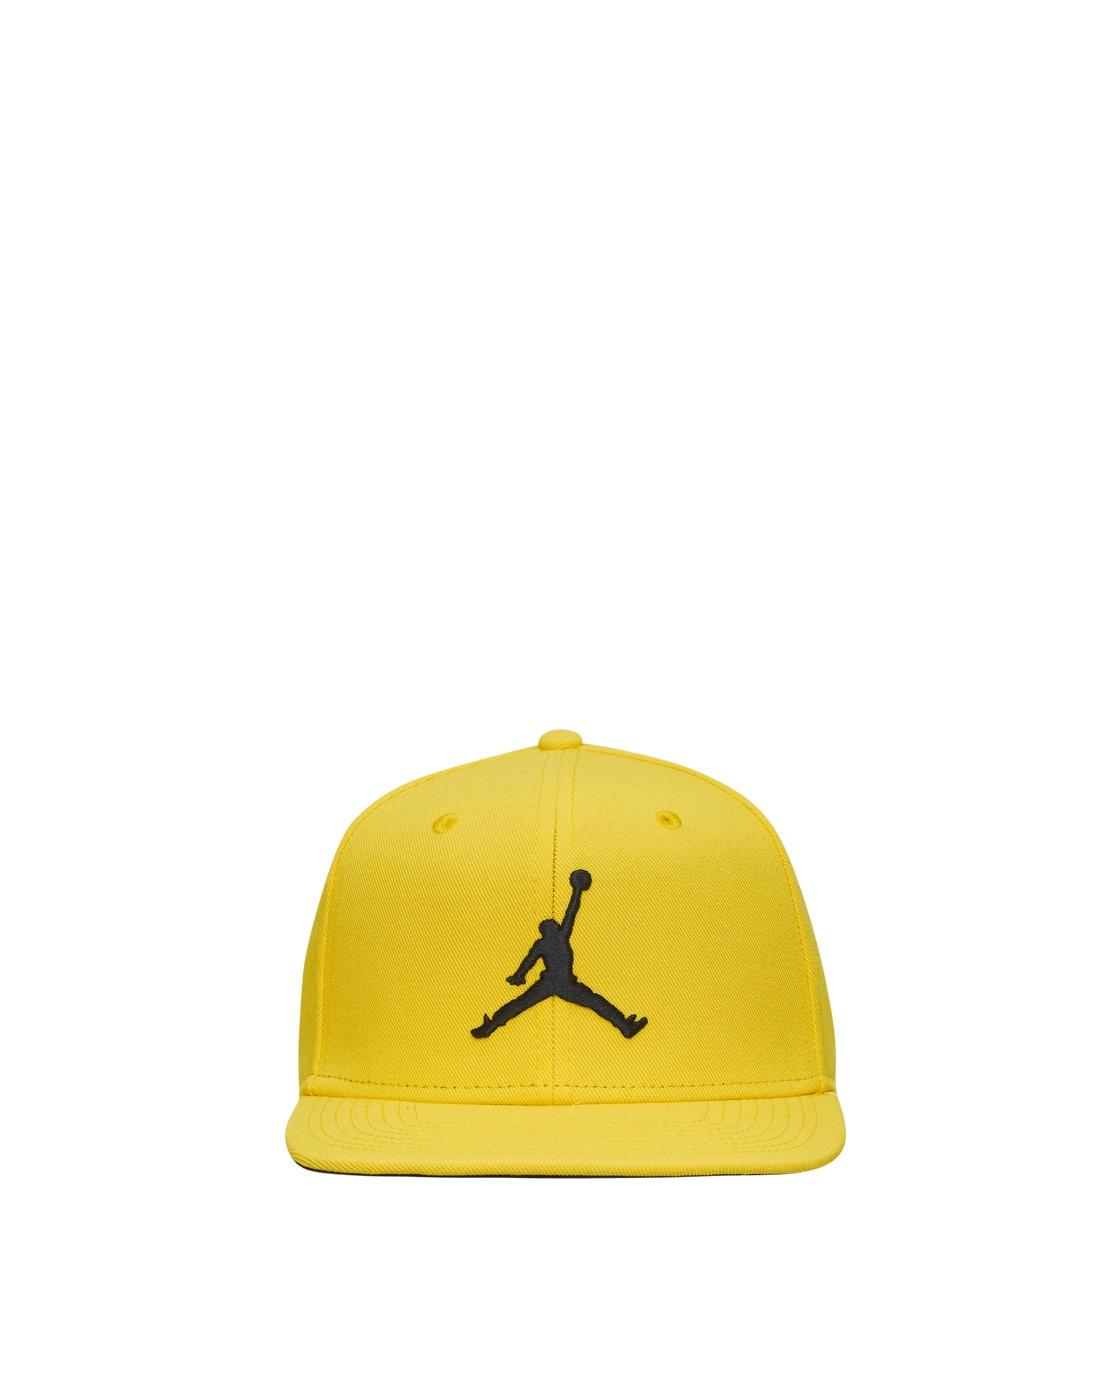 Photo: Nike Jordan Pro Jumpman Snapback Hat Tour Yellow/Black